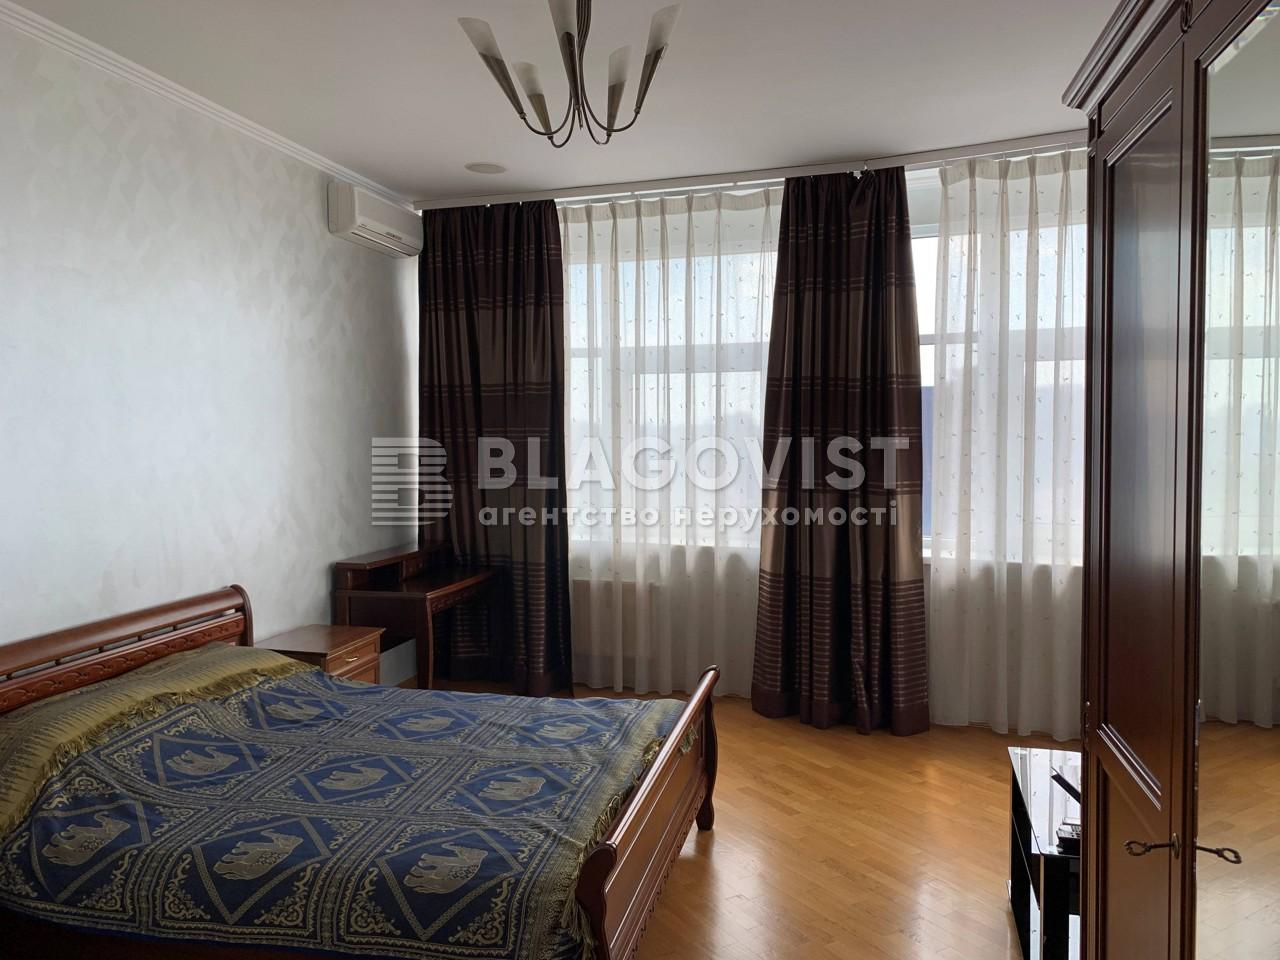 Квартира C-77006, Хмельницкого Богдана, 41, Киев - Фото 7